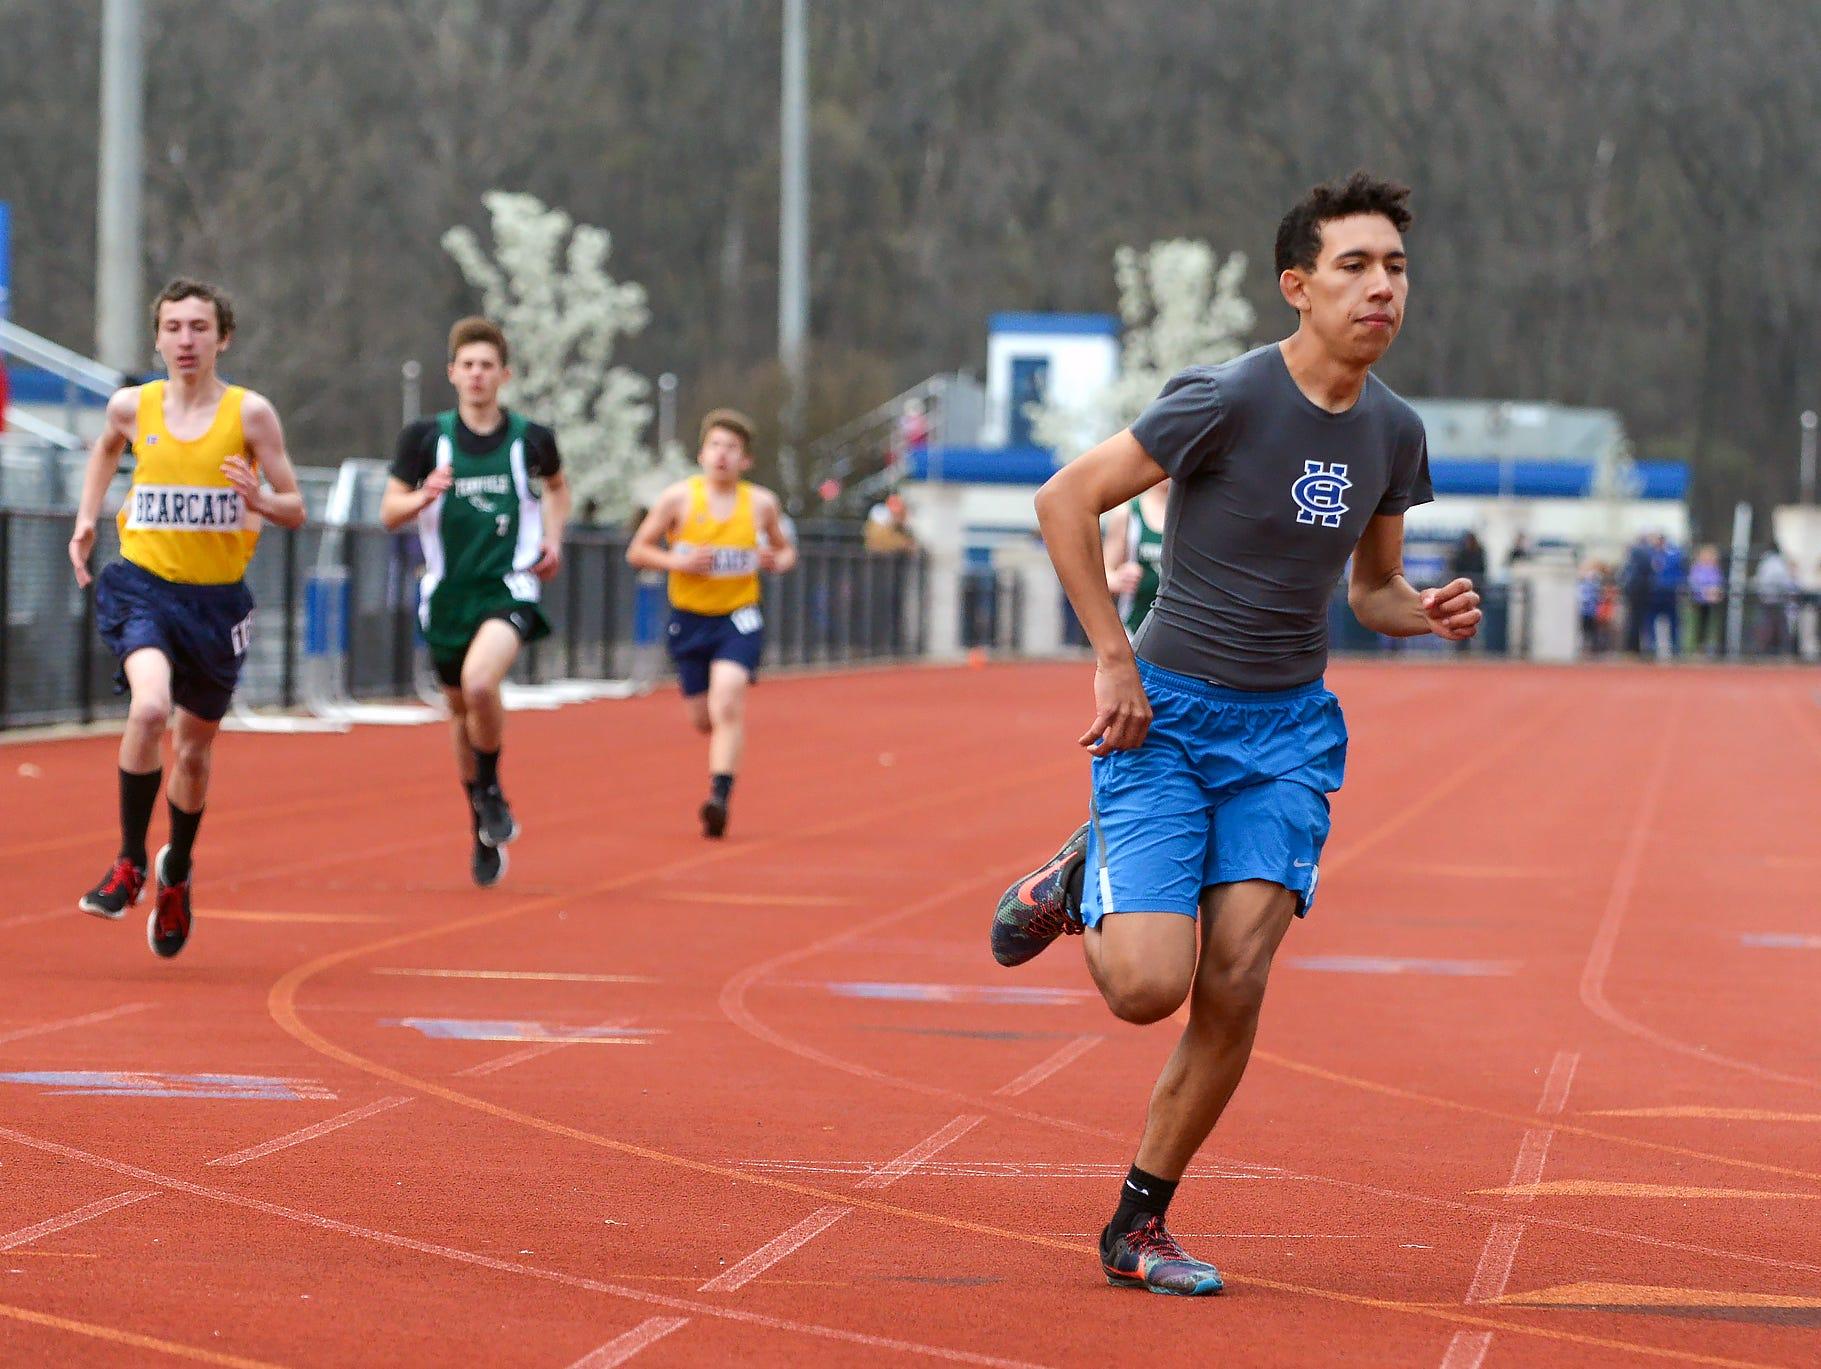 2016 All City Track Meet - 1600 meter run.